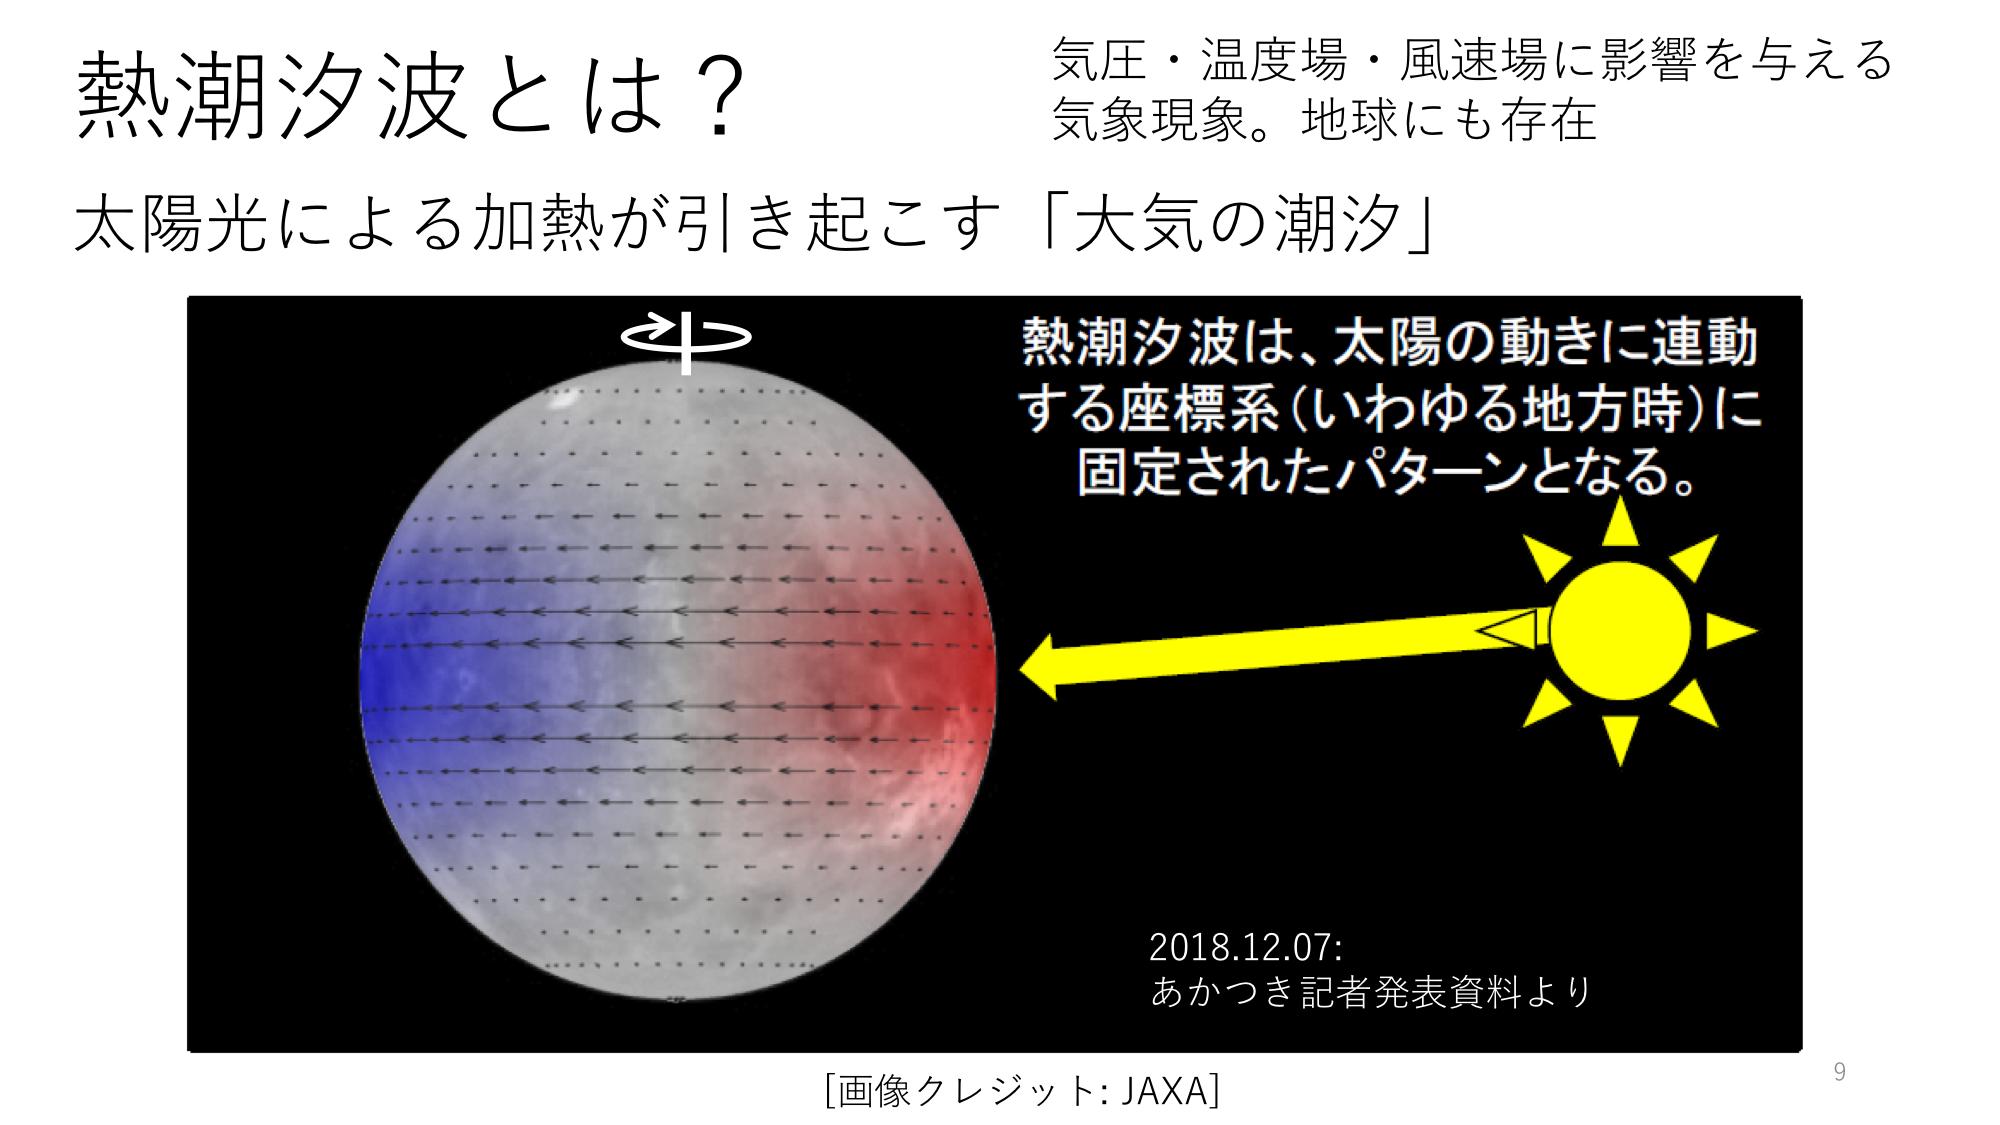 f:id:Imamura:20191119205424p:plain